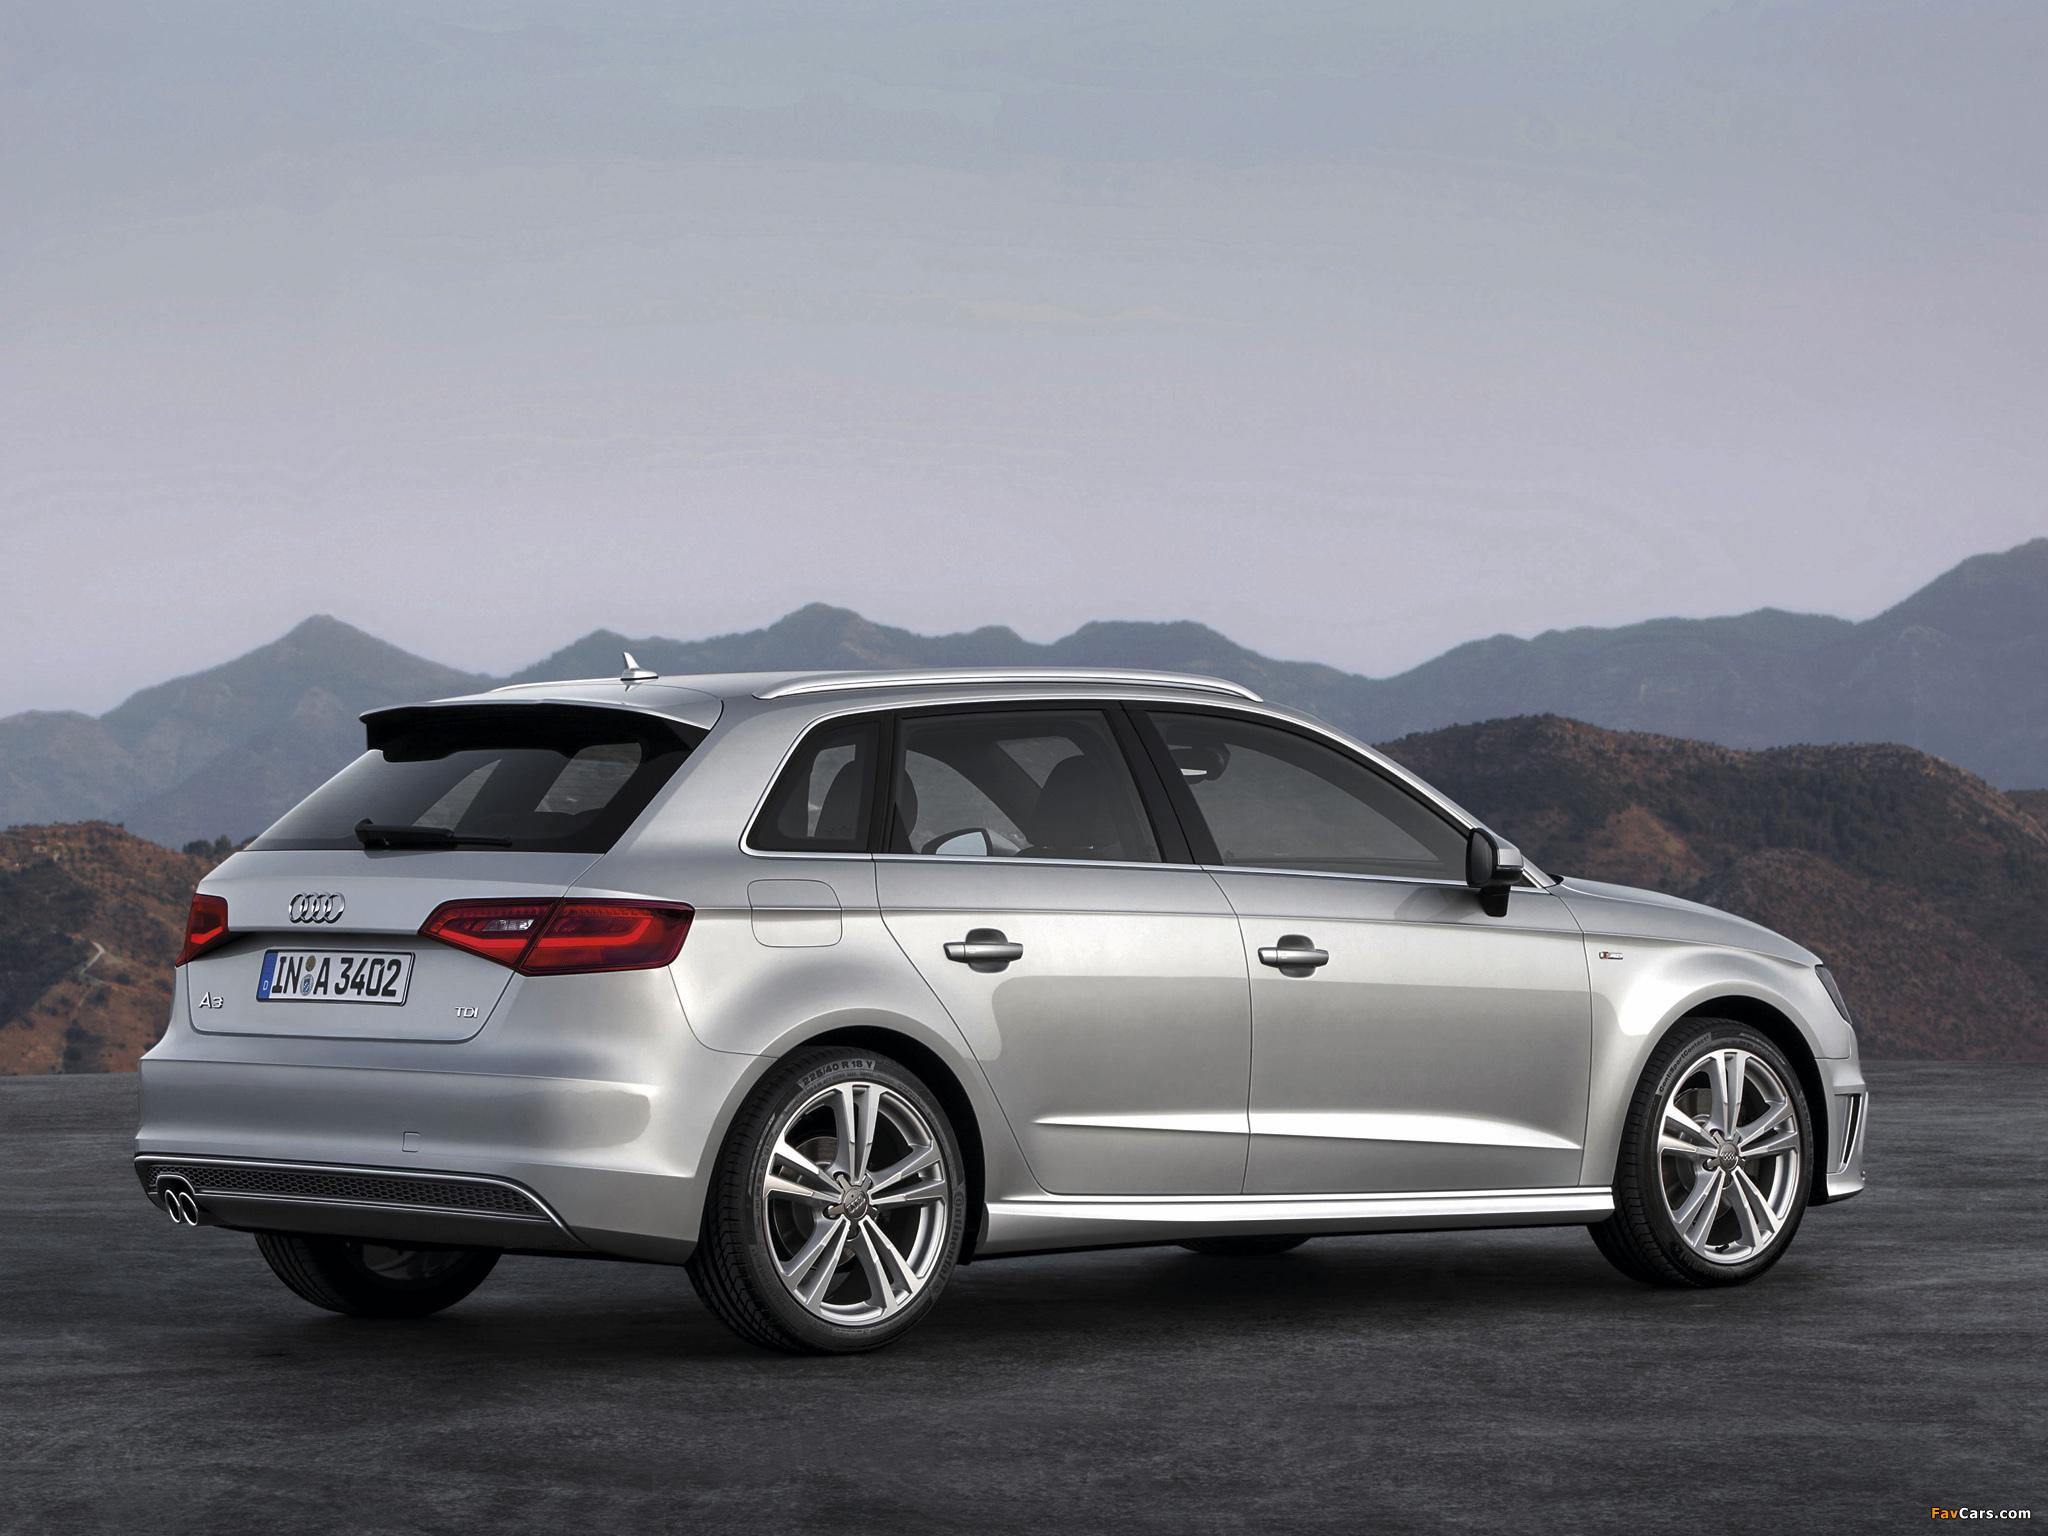 Audi A3 Sportback 2 0 Tdi S Line 8v 2012 Pictures